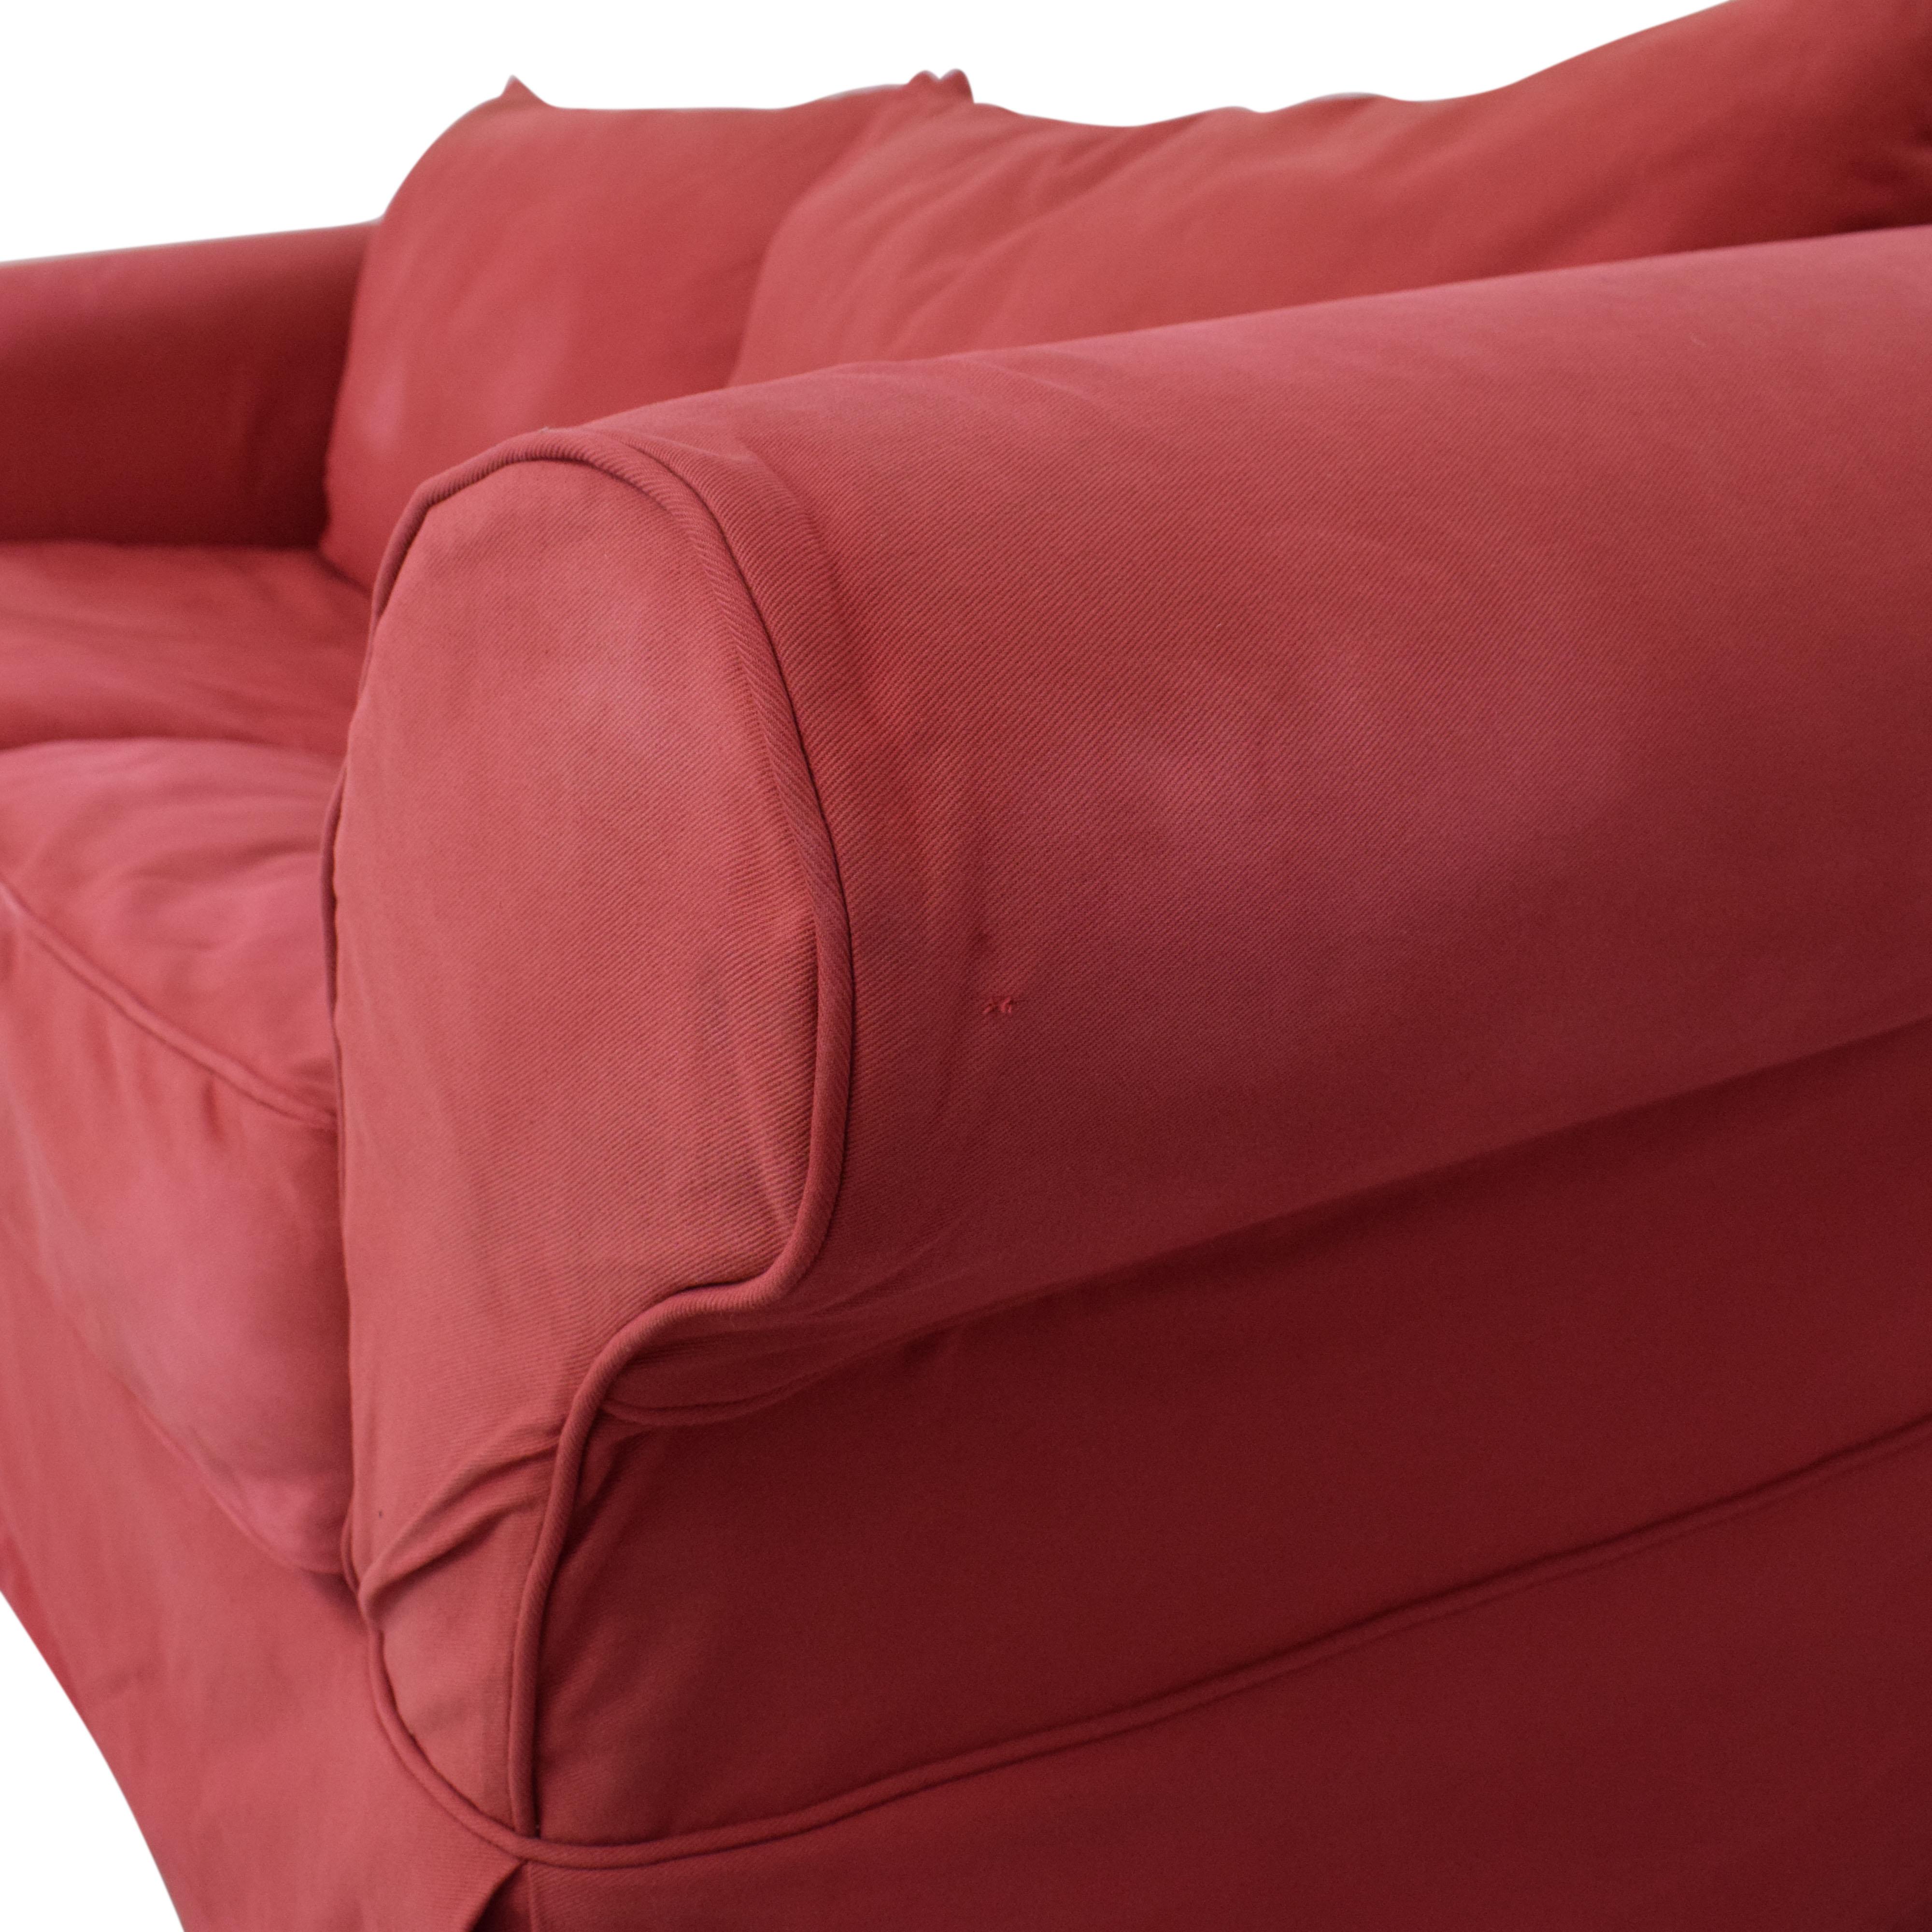 Storehouse Storehouse Queen Sleeper Sofa discount